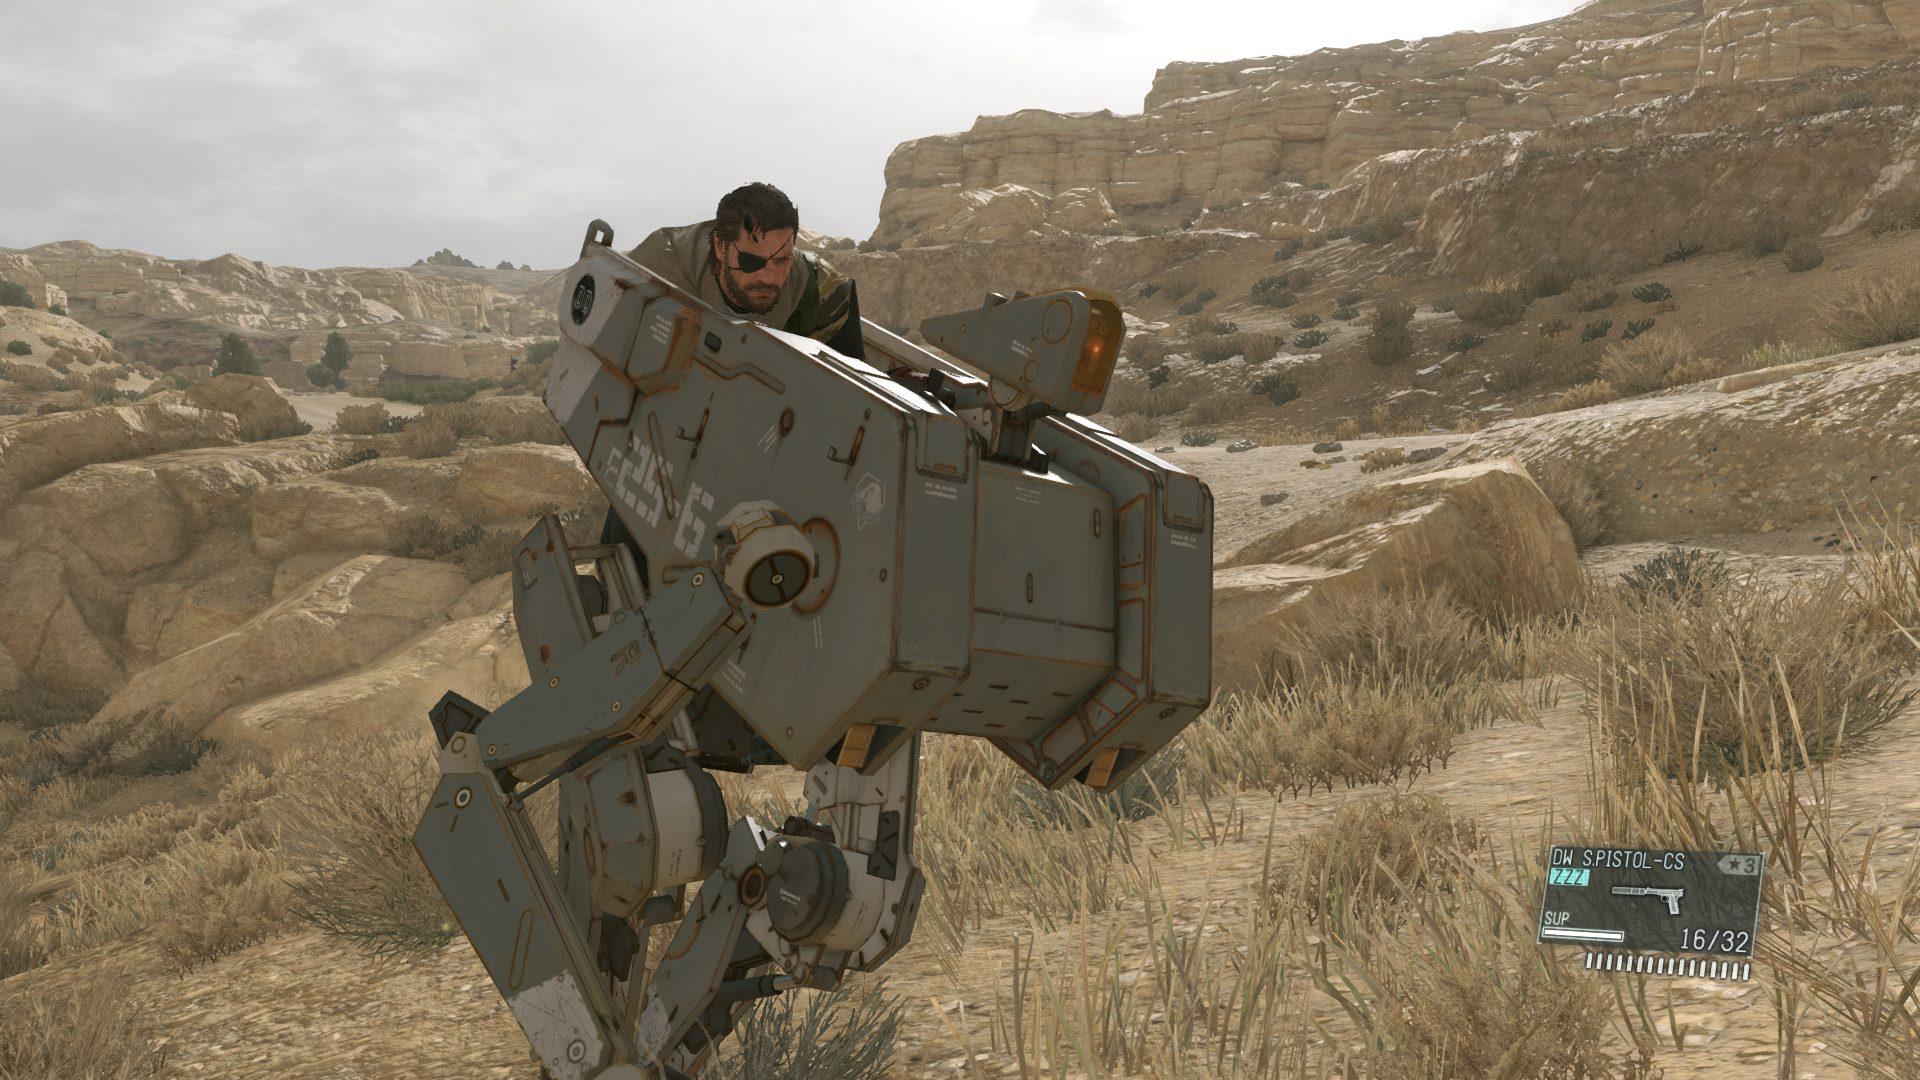 Metal-Gear-Solid-5